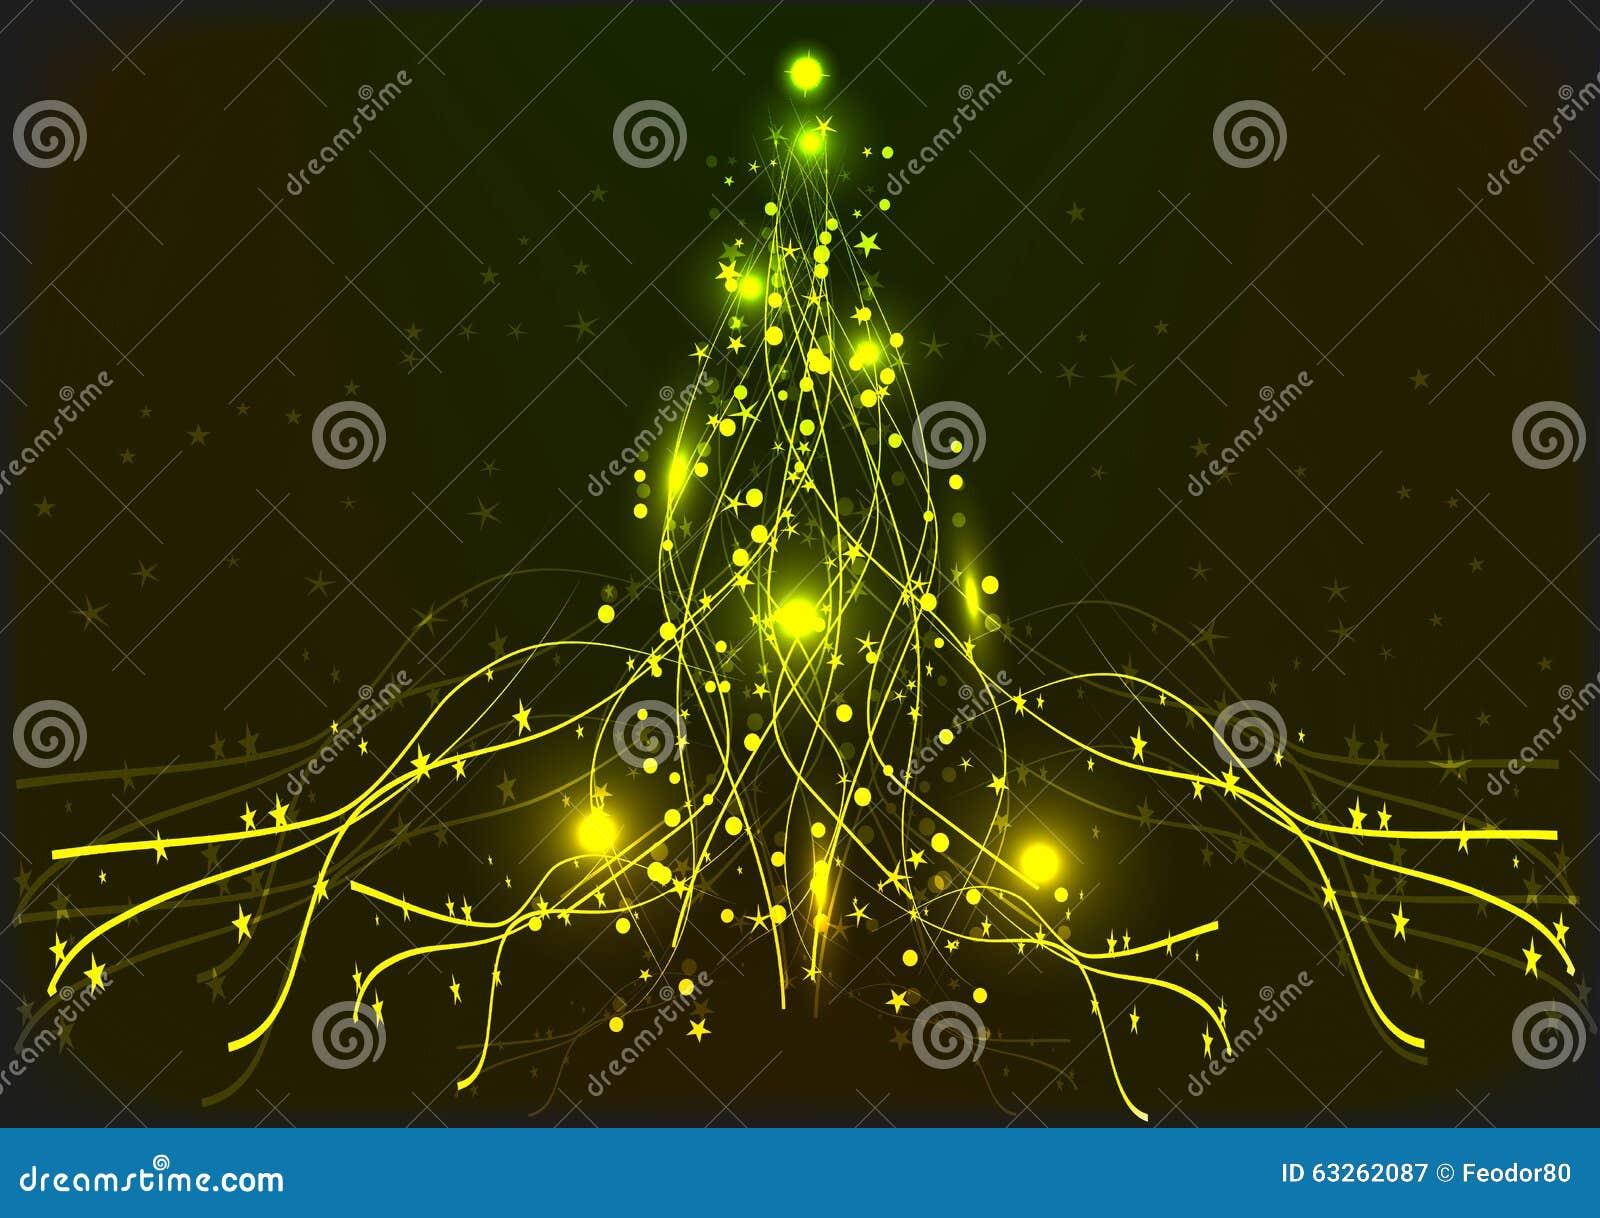 Yellow Neon Christmas Tree. Background. Stock Vector - Image: 63262087